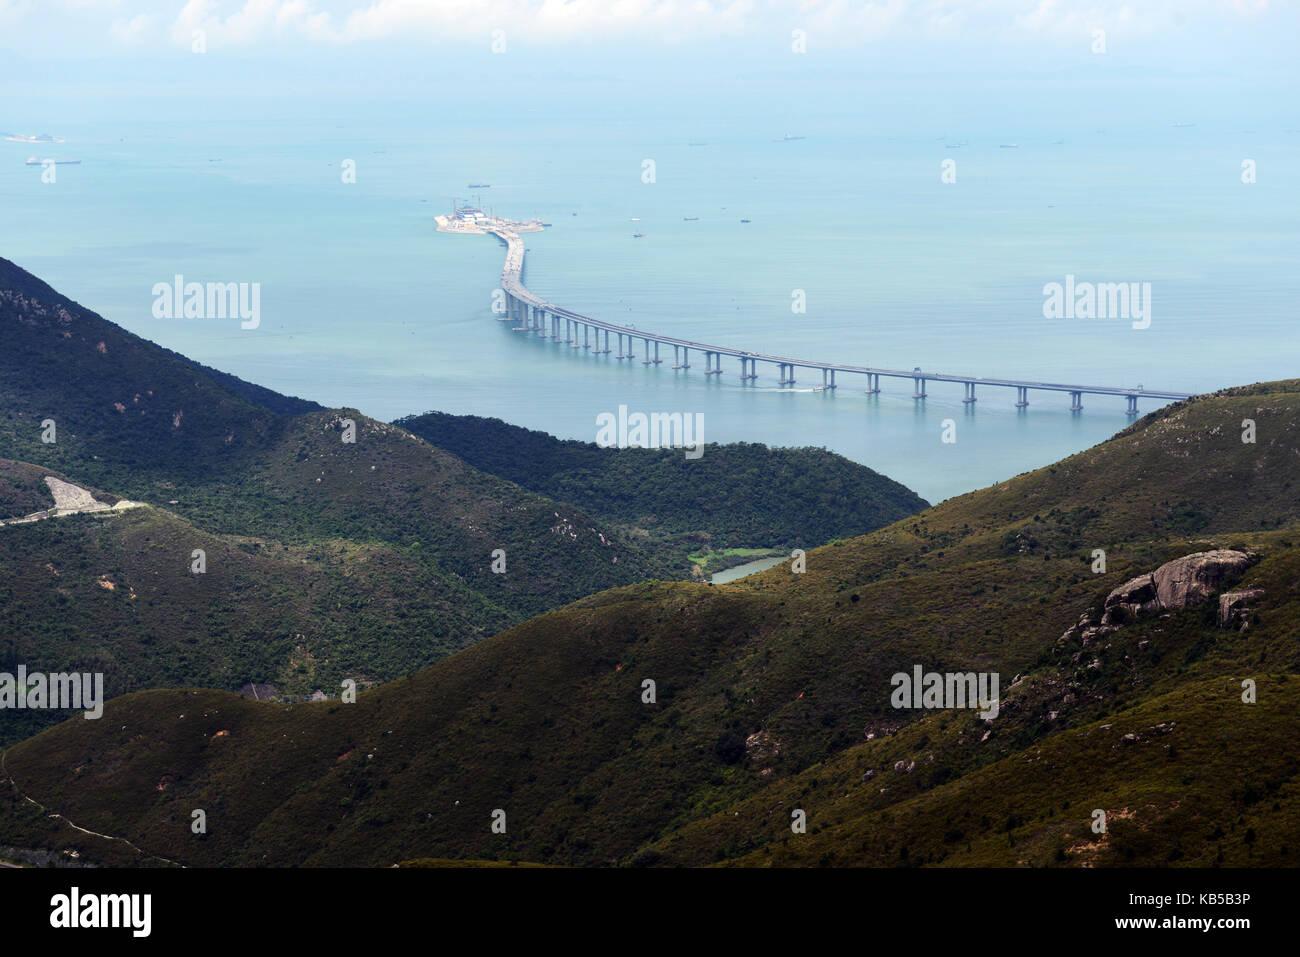 Aerial view of the new Hong Kong–Zhuhai–Macau Bridge construction site. - Stock Image